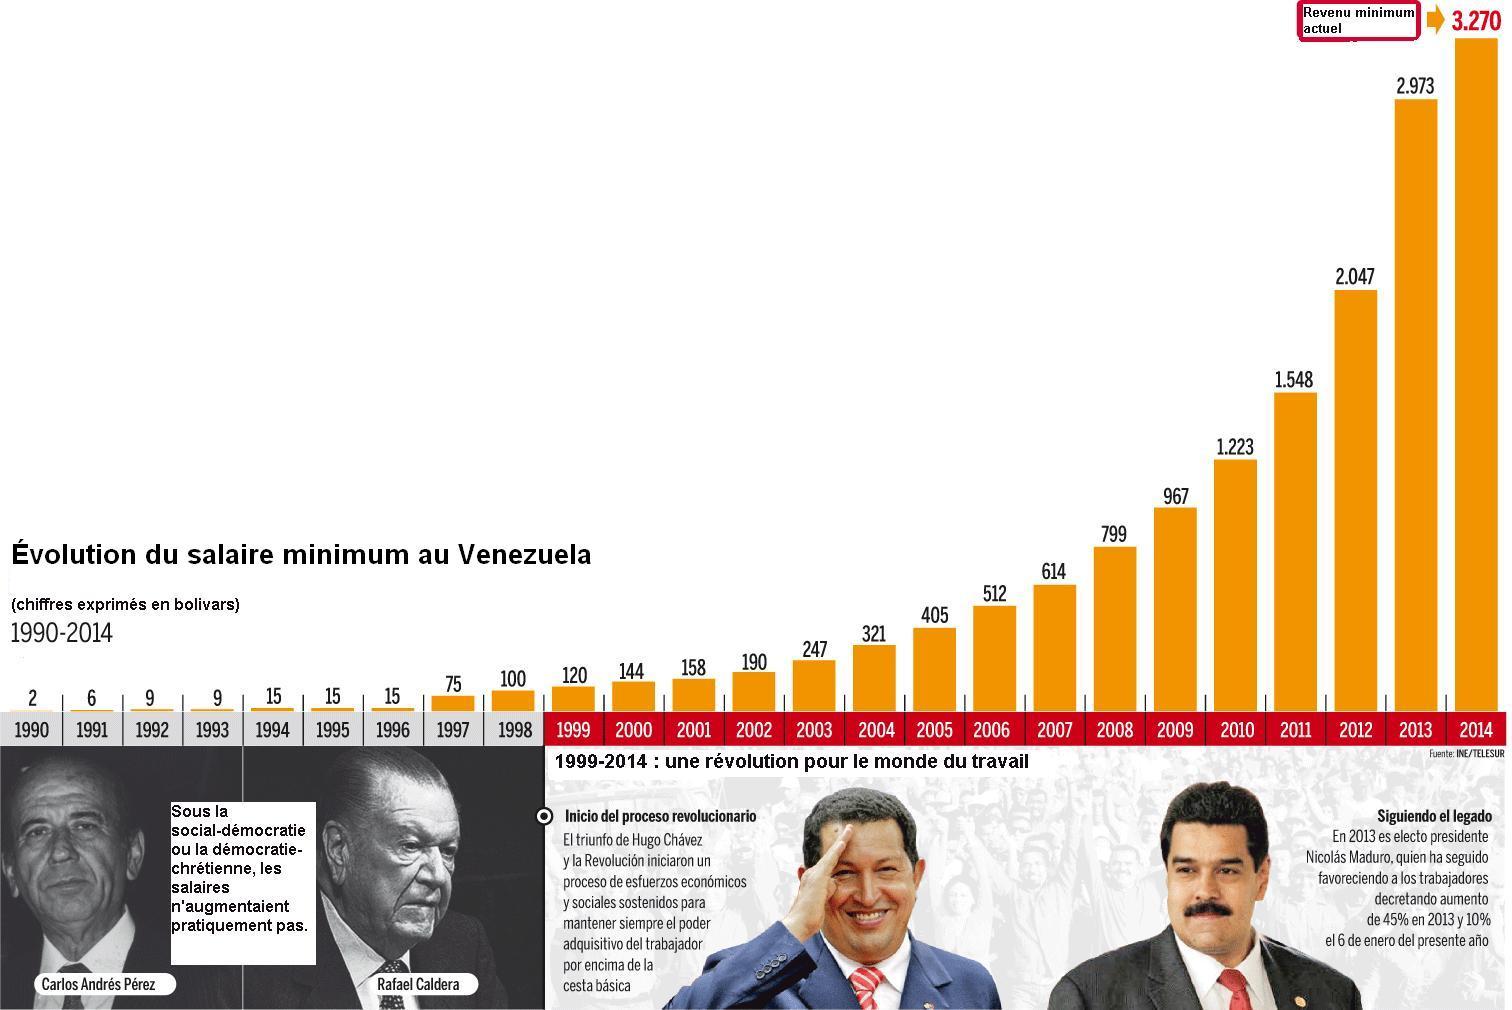 RdB non-inconditionnel Vénézuela 1990 - 2014